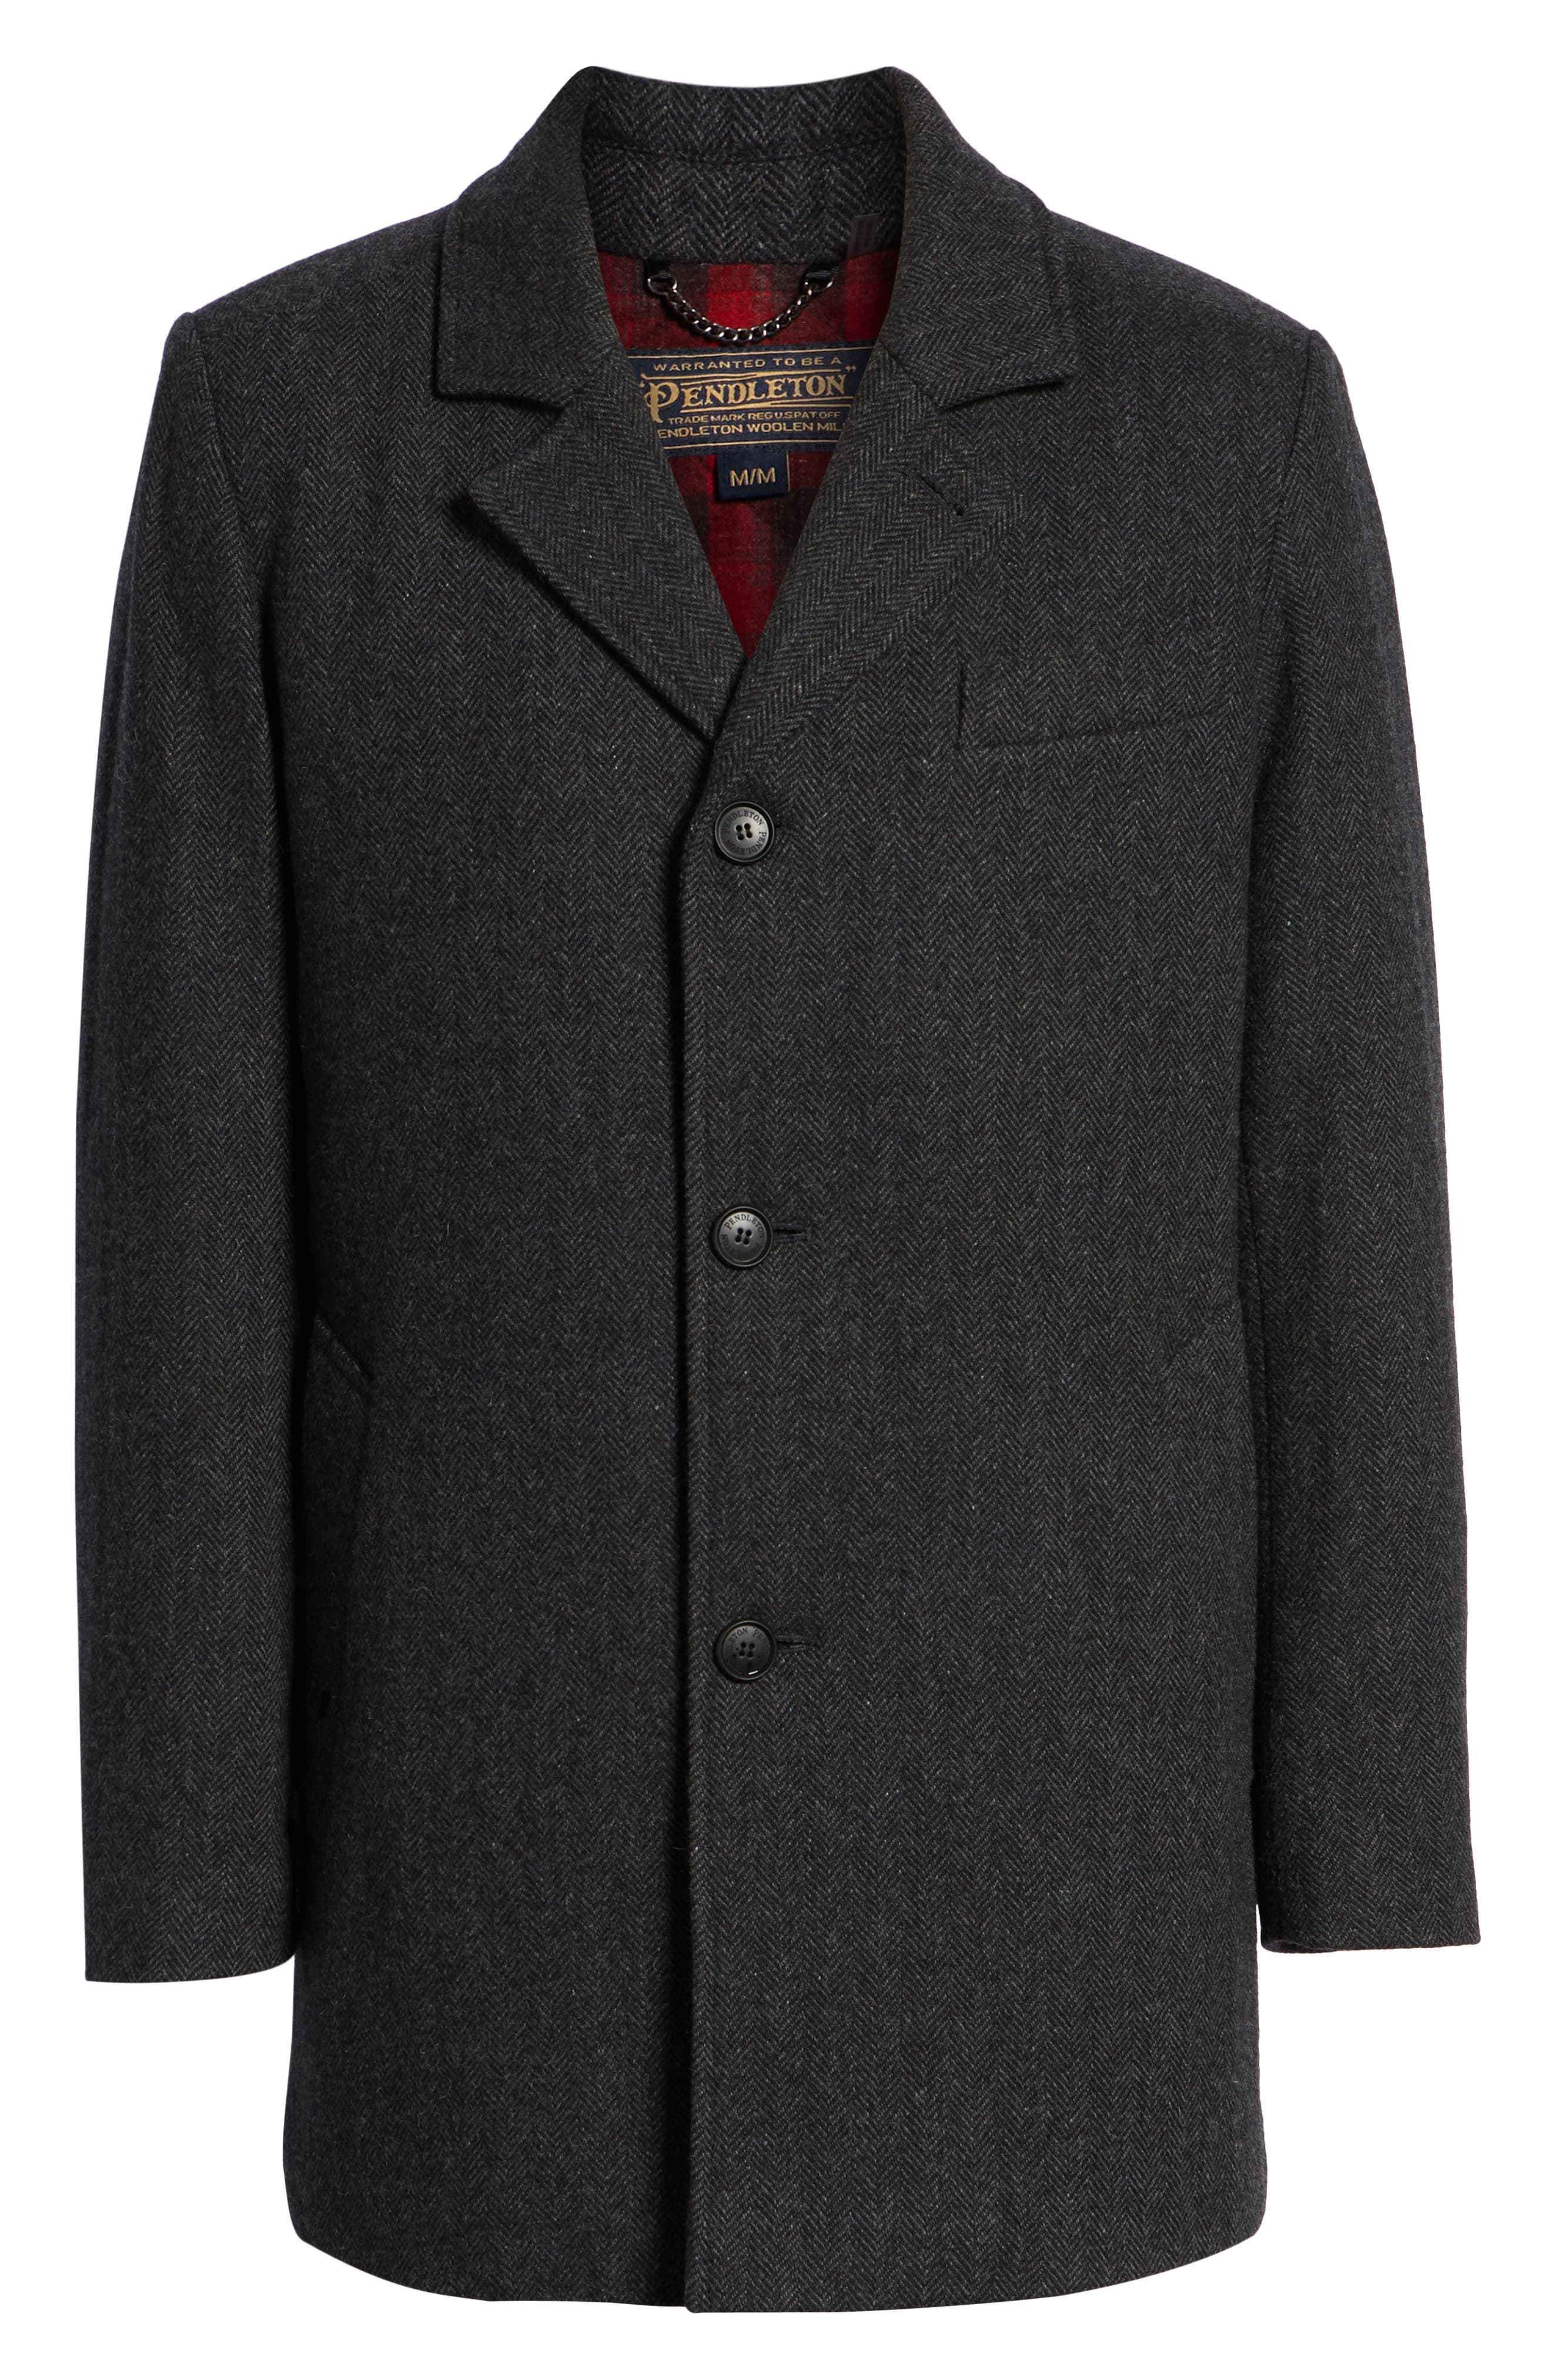 PENDLETON, Iconic Textures Manhattan Wool Blend Top Coat, Alternate thumbnail 6, color, CHARCOAL HERRINGBONE